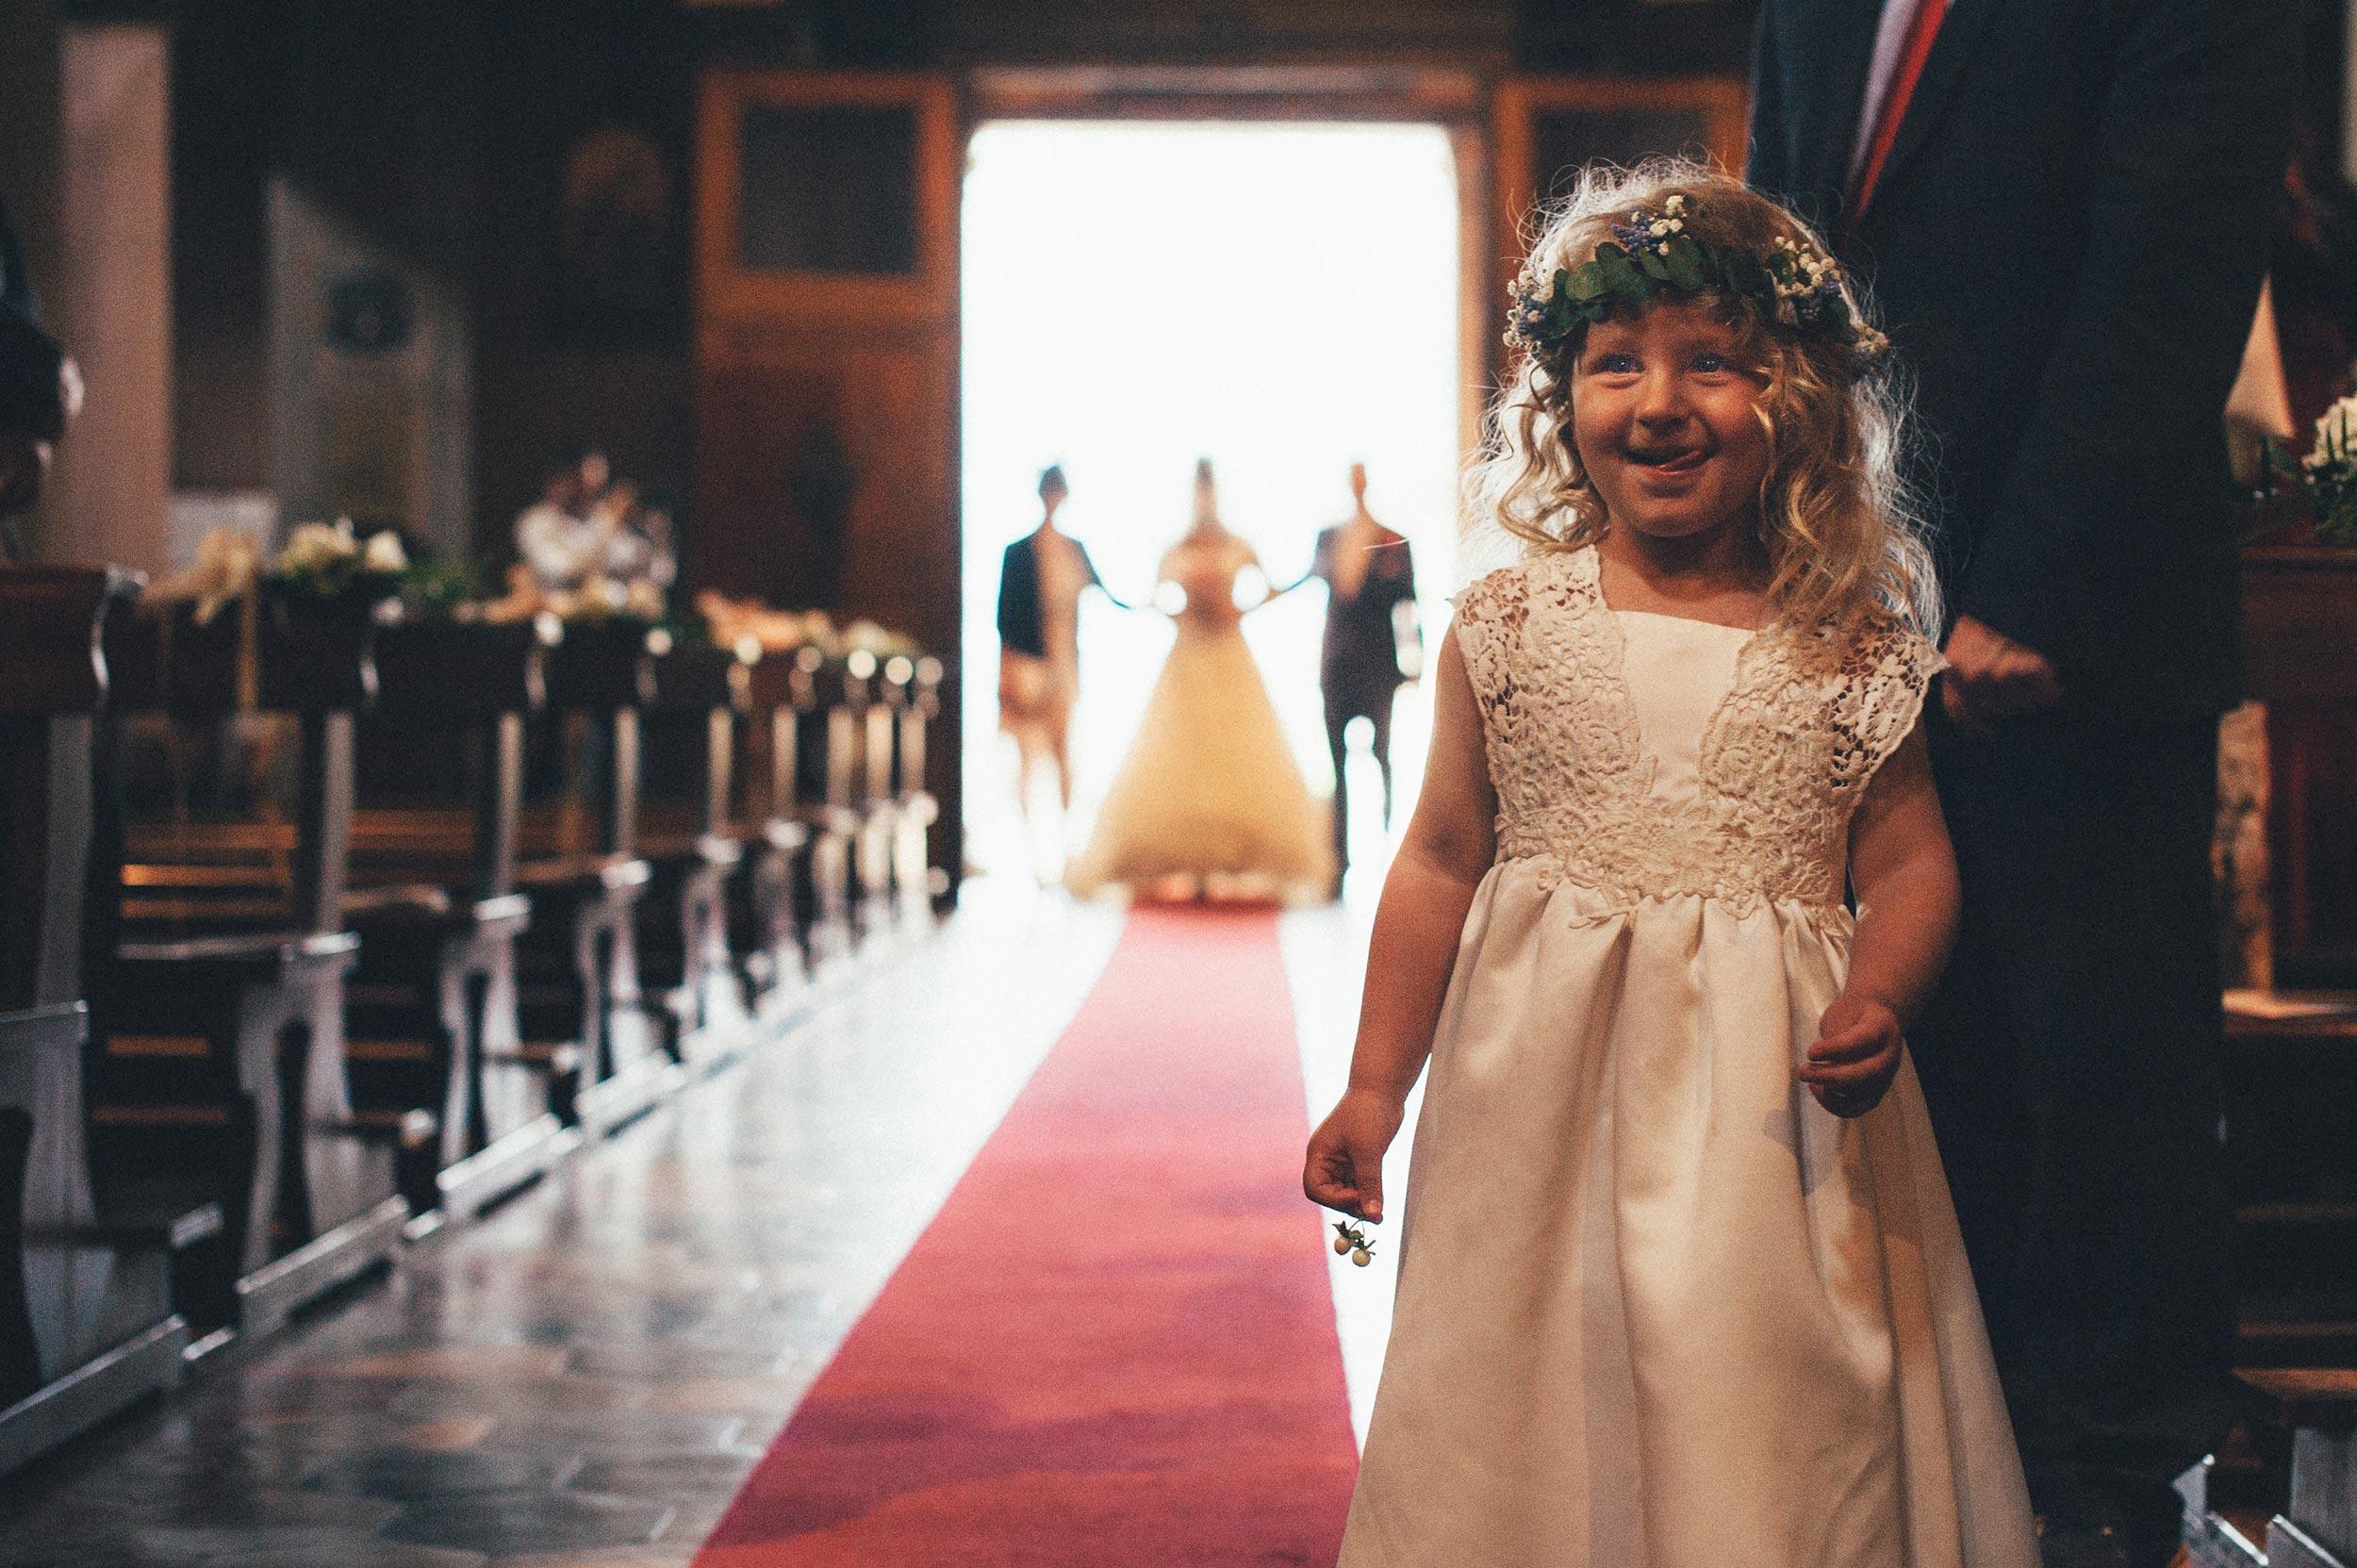 2016-Julius-Silke-Lake-Orta-Wedding-Photographer-Italy-Alessandro-Avenali-38.jpg